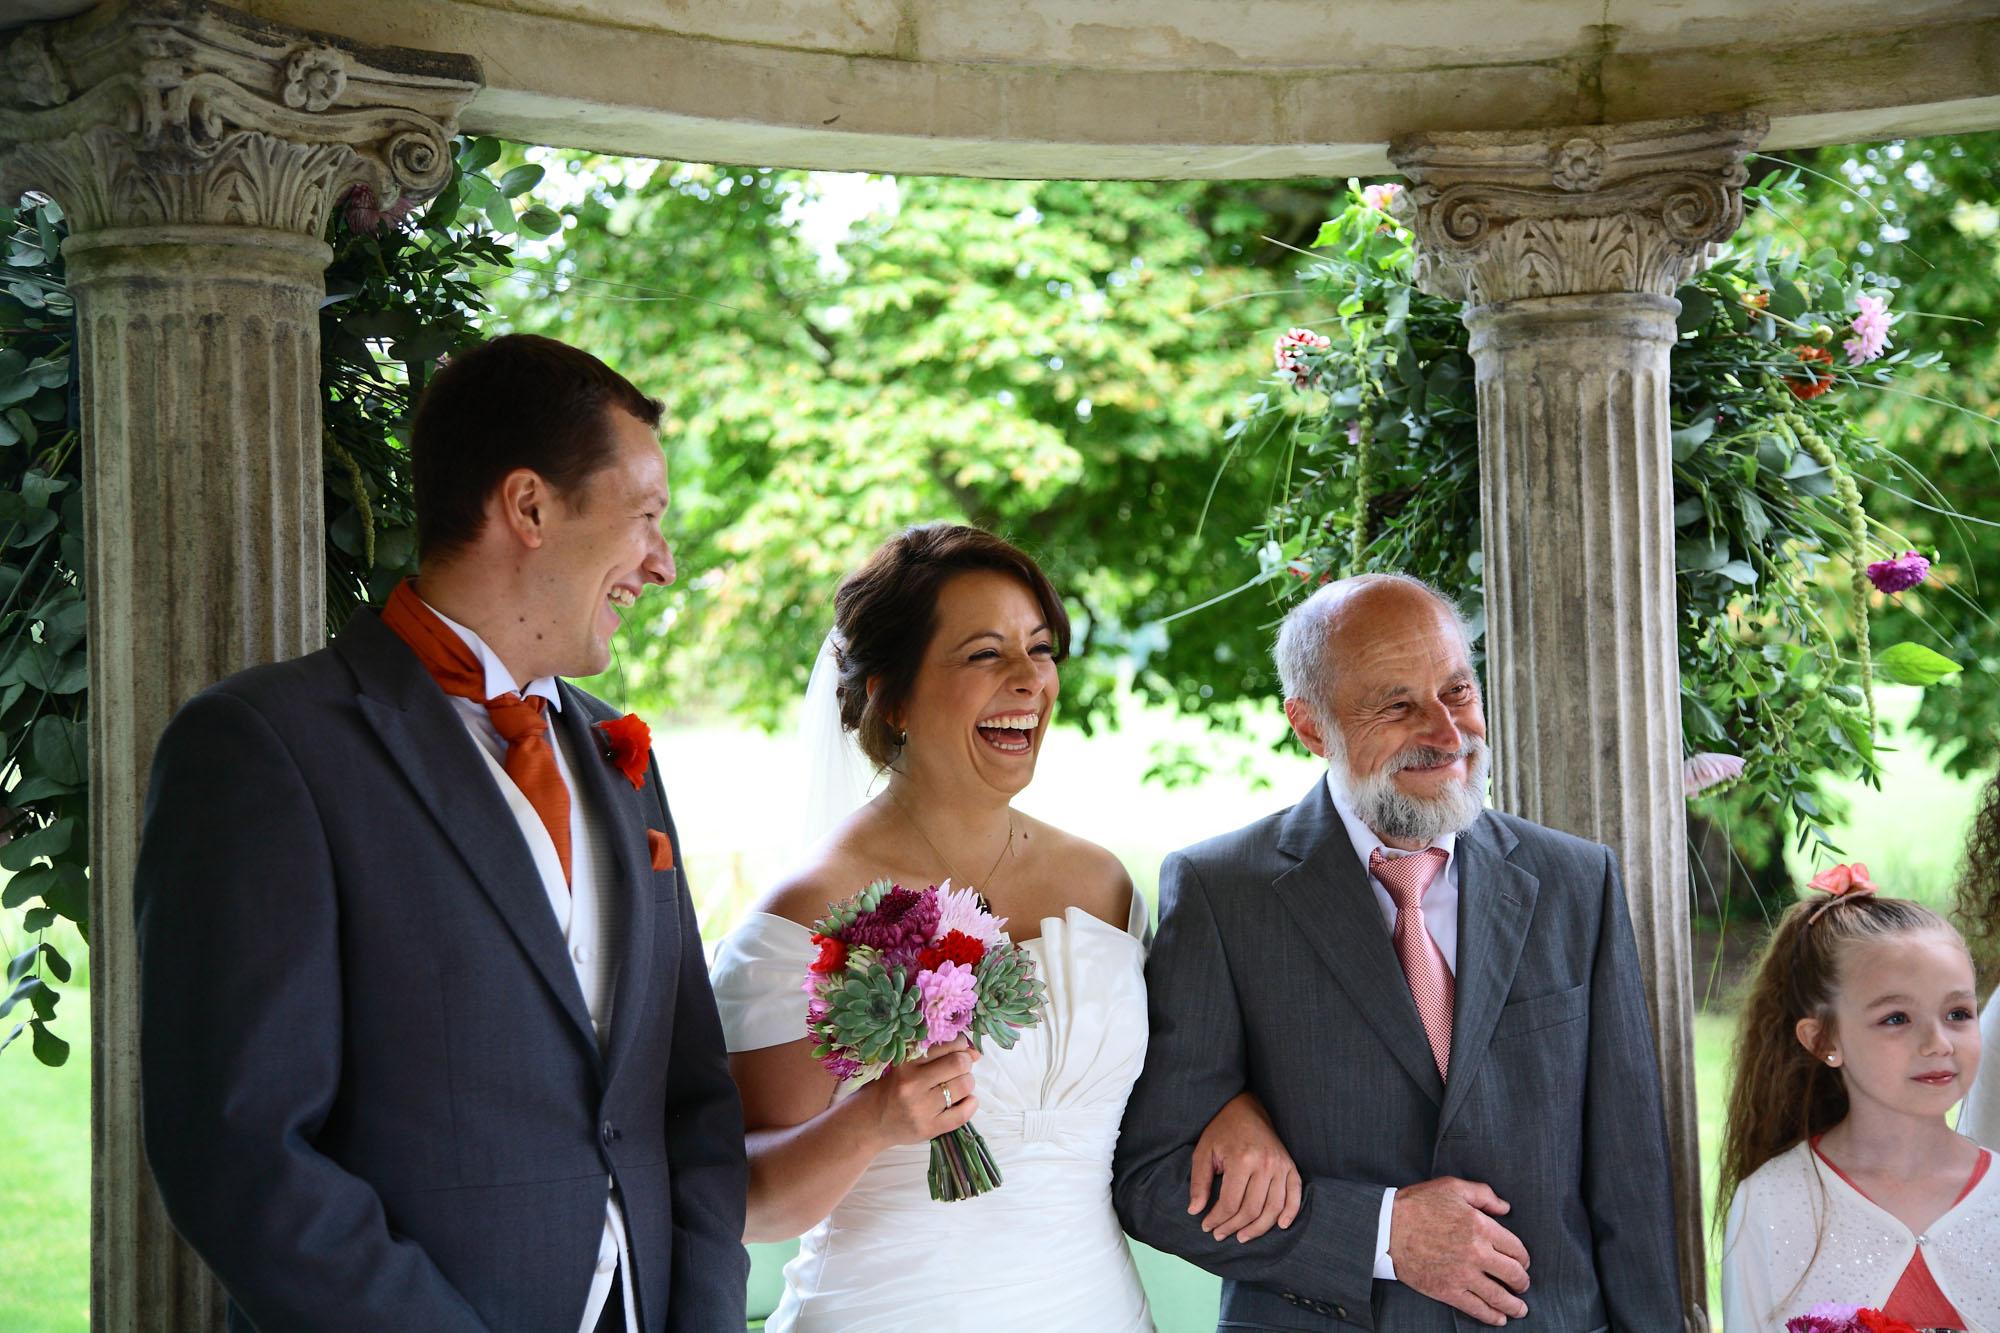 weddings-couples-love-photographer-oxford-london-jonathan-self-photography-28.jpg